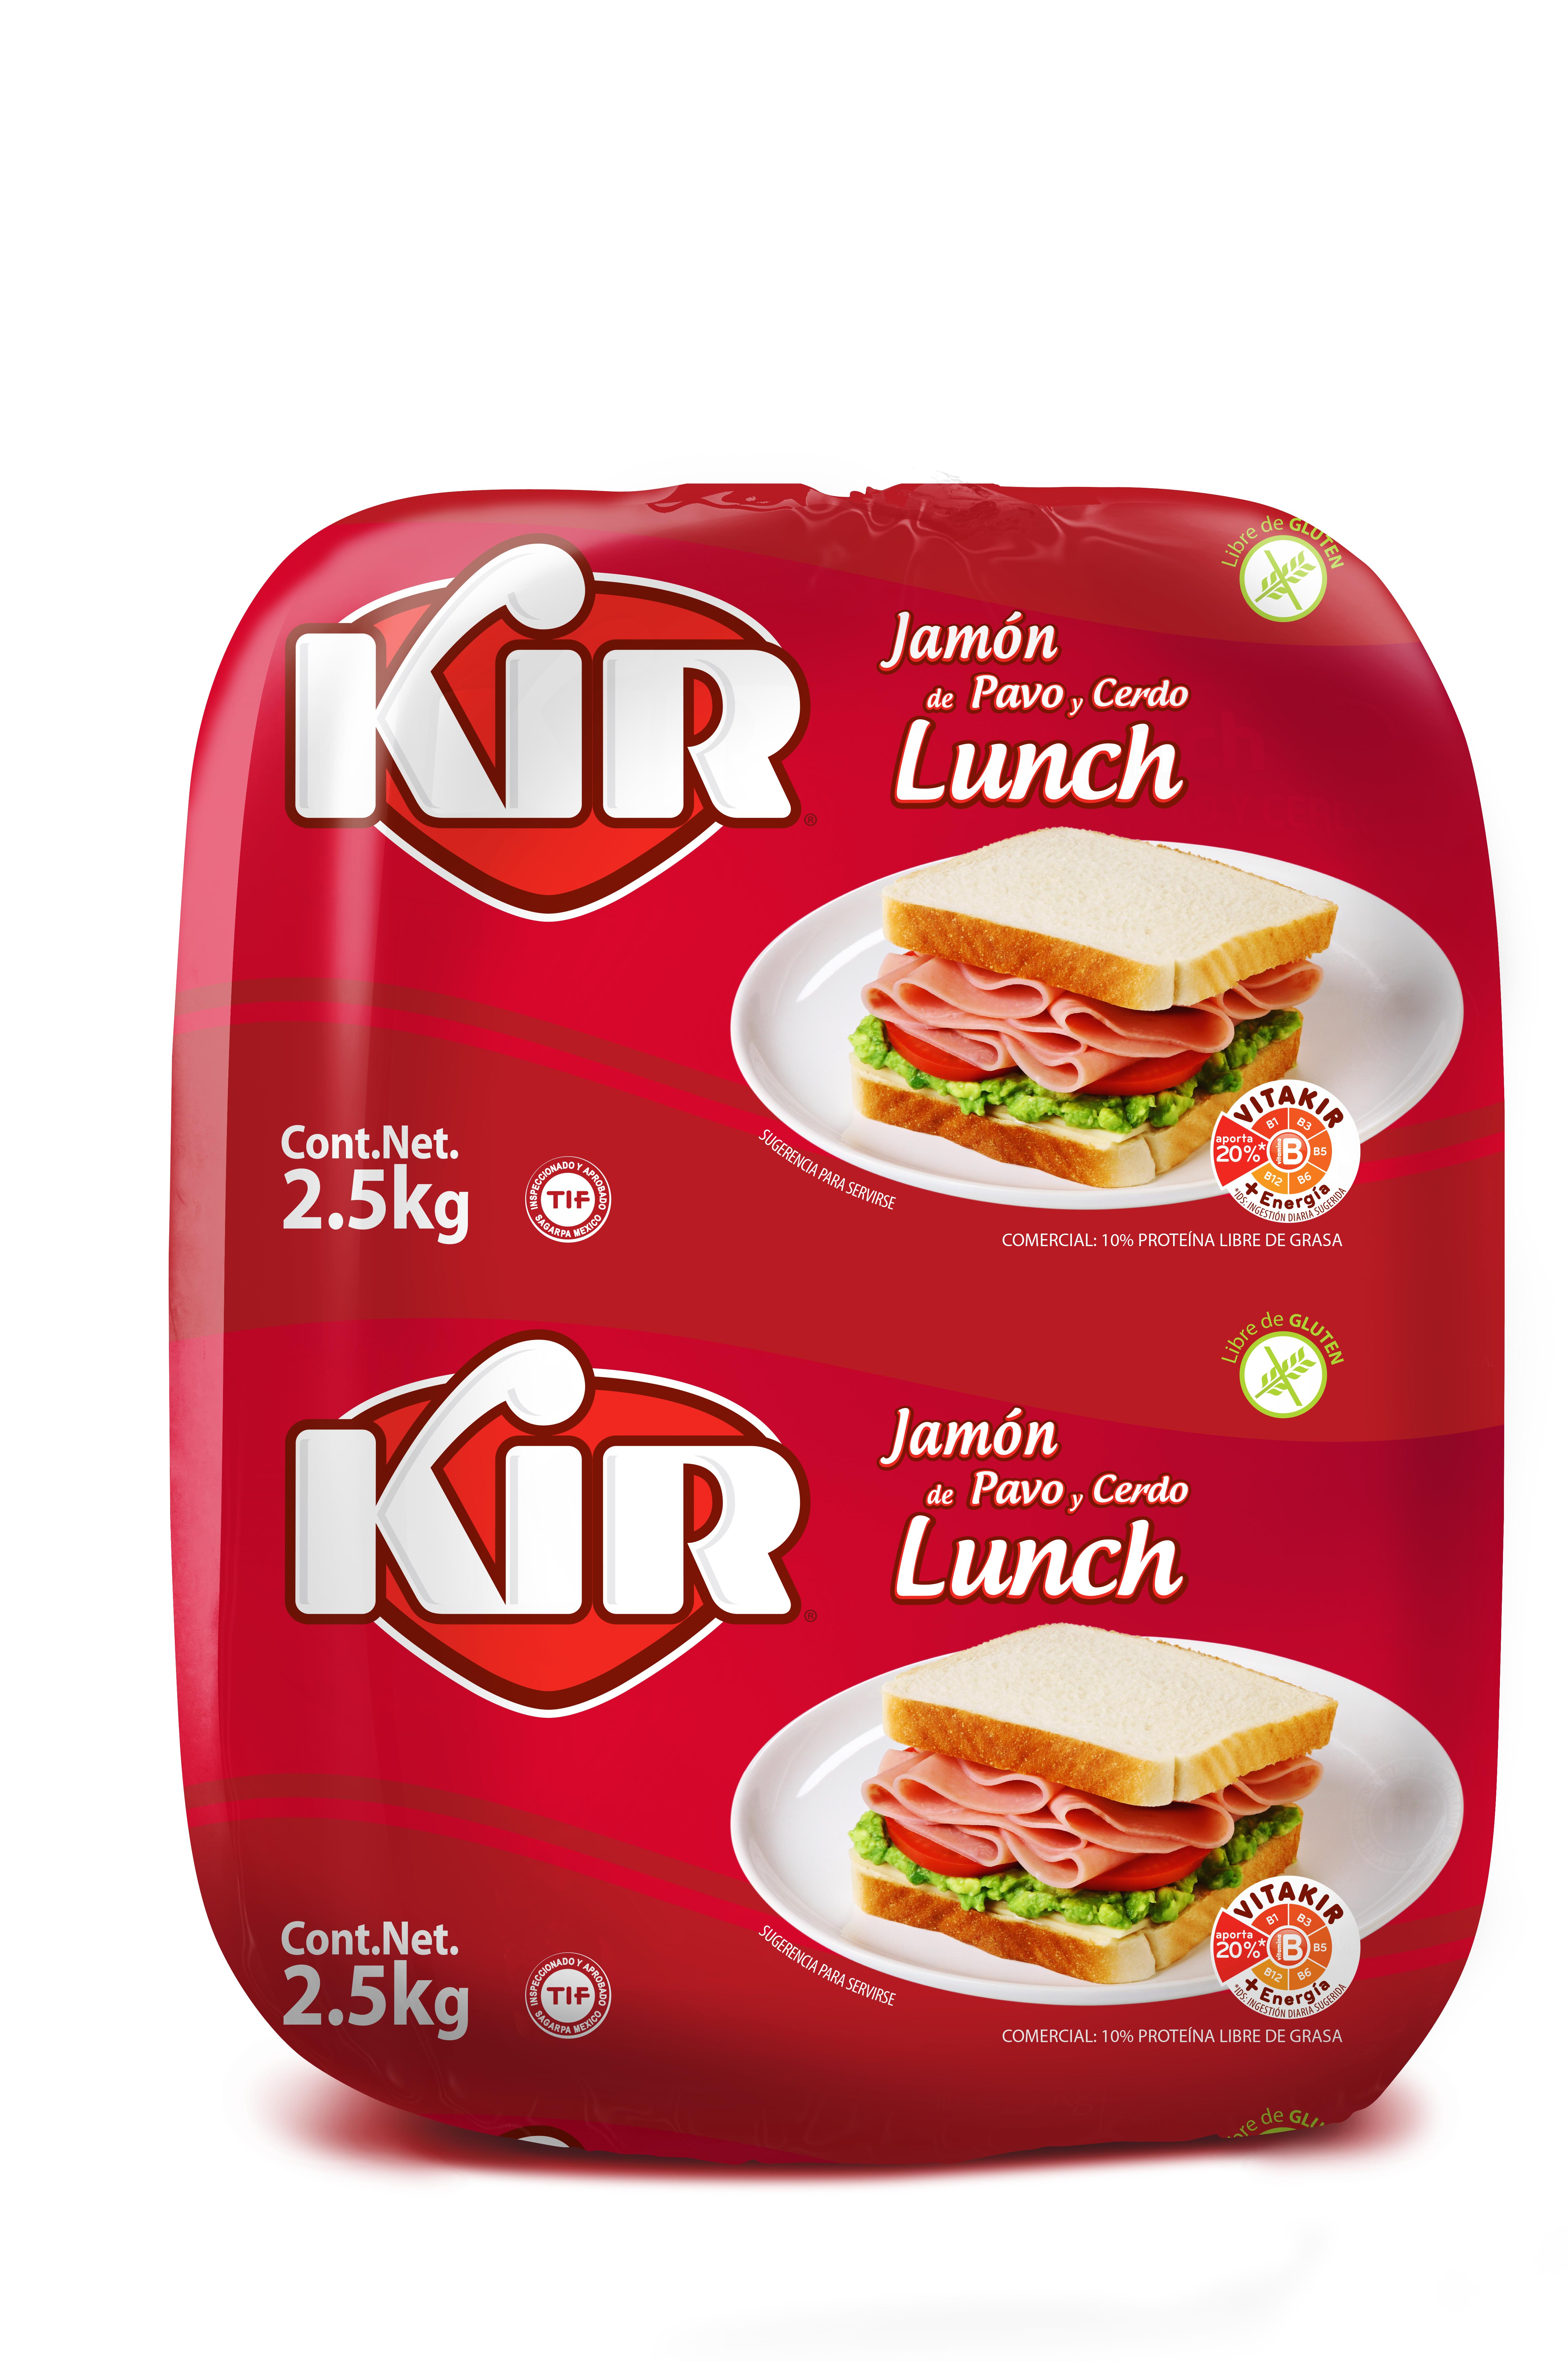 X576-Jamon Lunch Pavo y cerdo-Kir